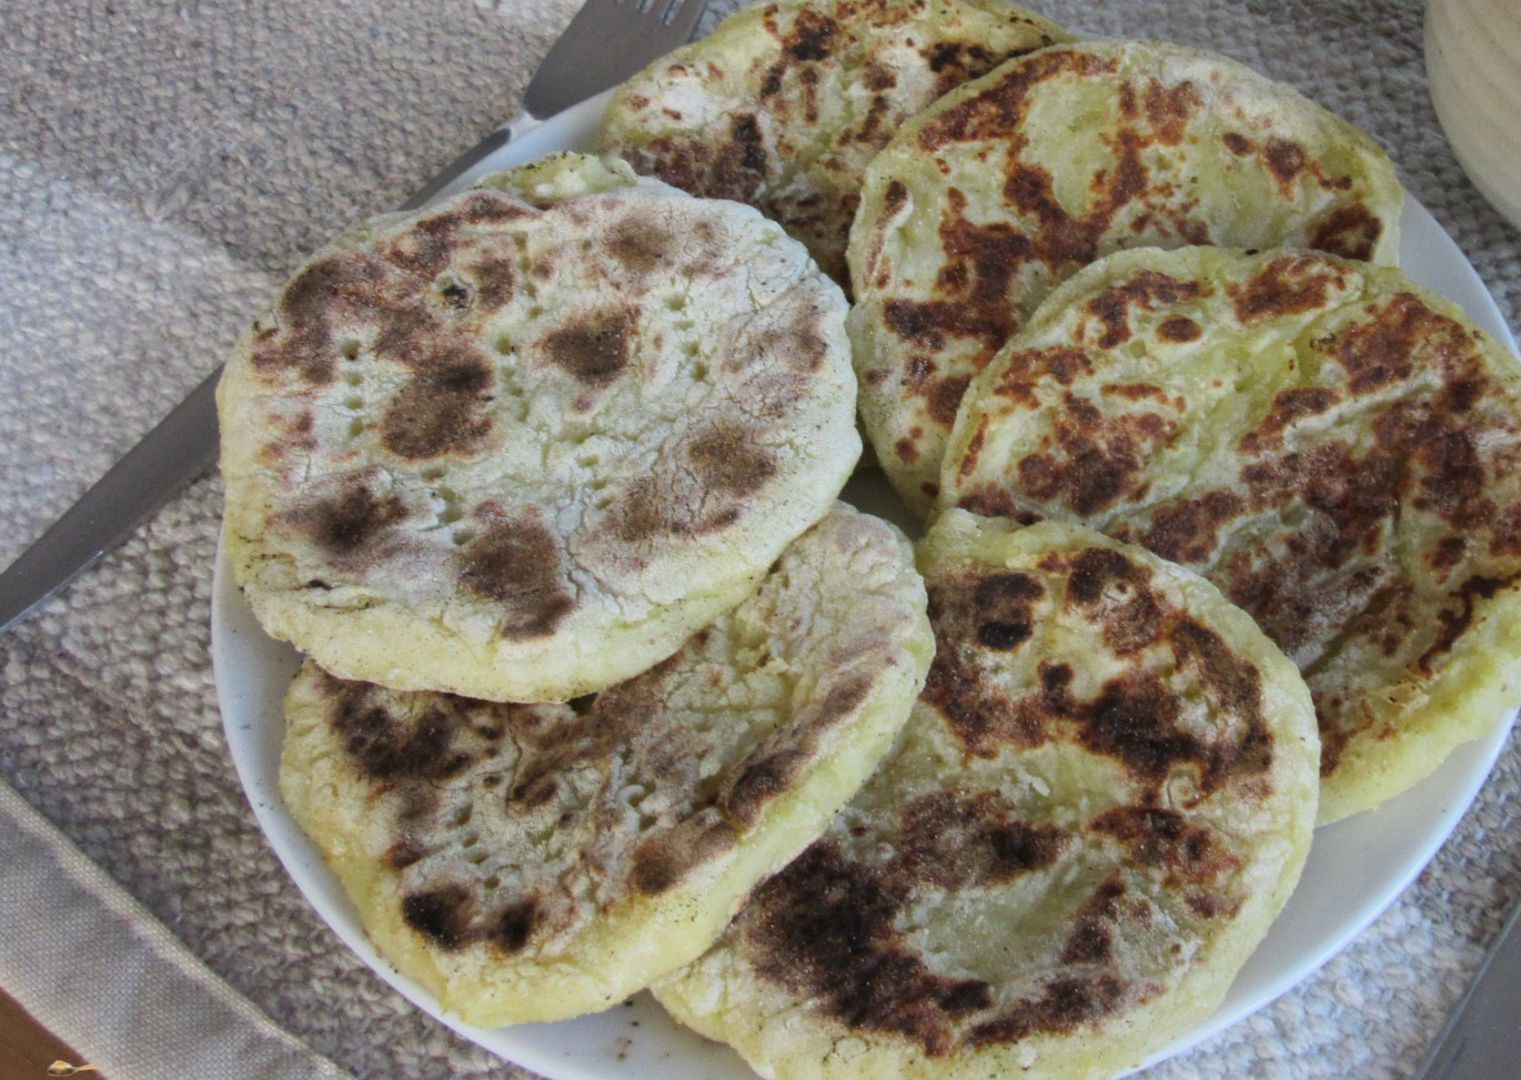 Bramborové placky z vařených brambor recept